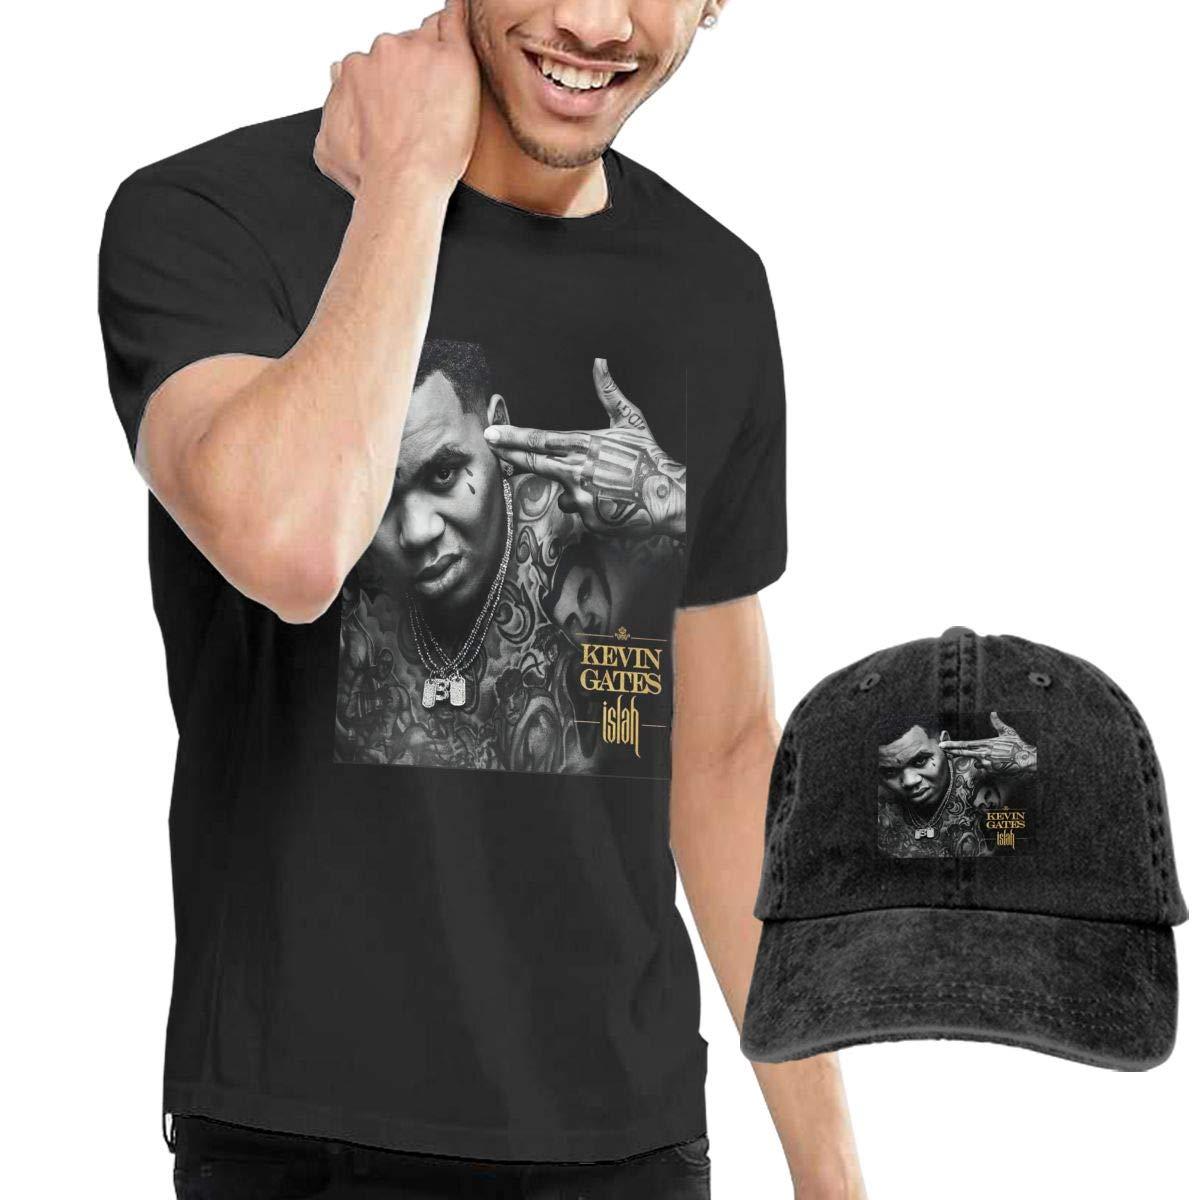 Hfusih.fhs6f789 Kevin Gates Adult Cap Adjustable Cowboys Hats Baseball Cap 3XL Black